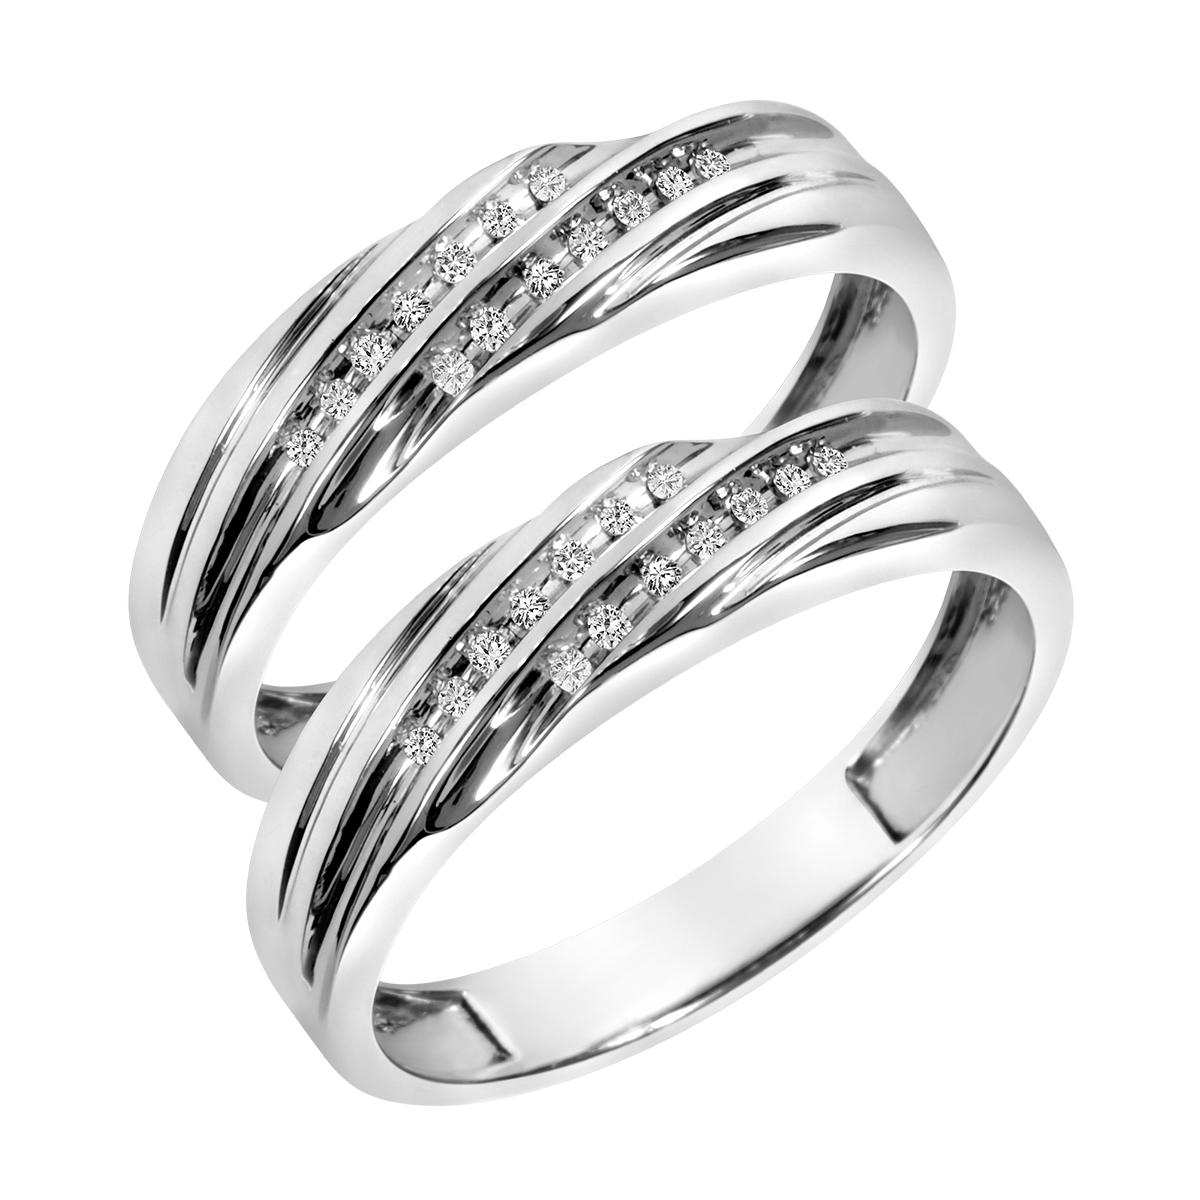 1/6 CT. T.W. Round Cut Mens  Same Sex Wedding Band Set 10K White Gold- Size 8